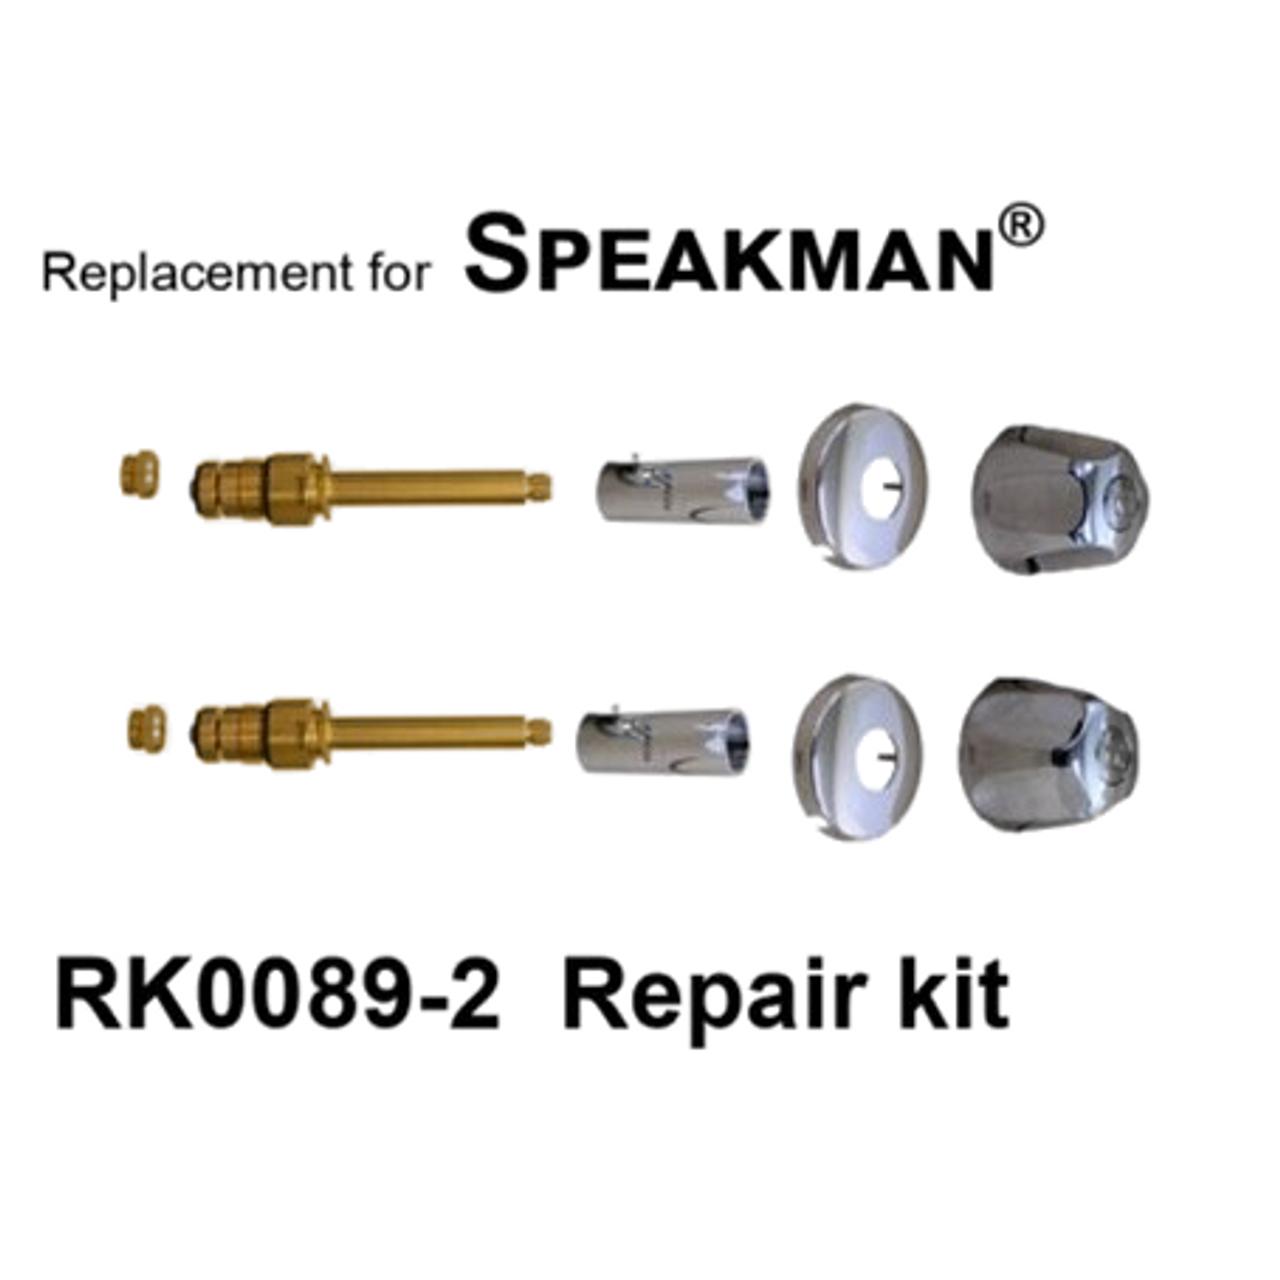 Speakman 2 Valve Rebuild Kit